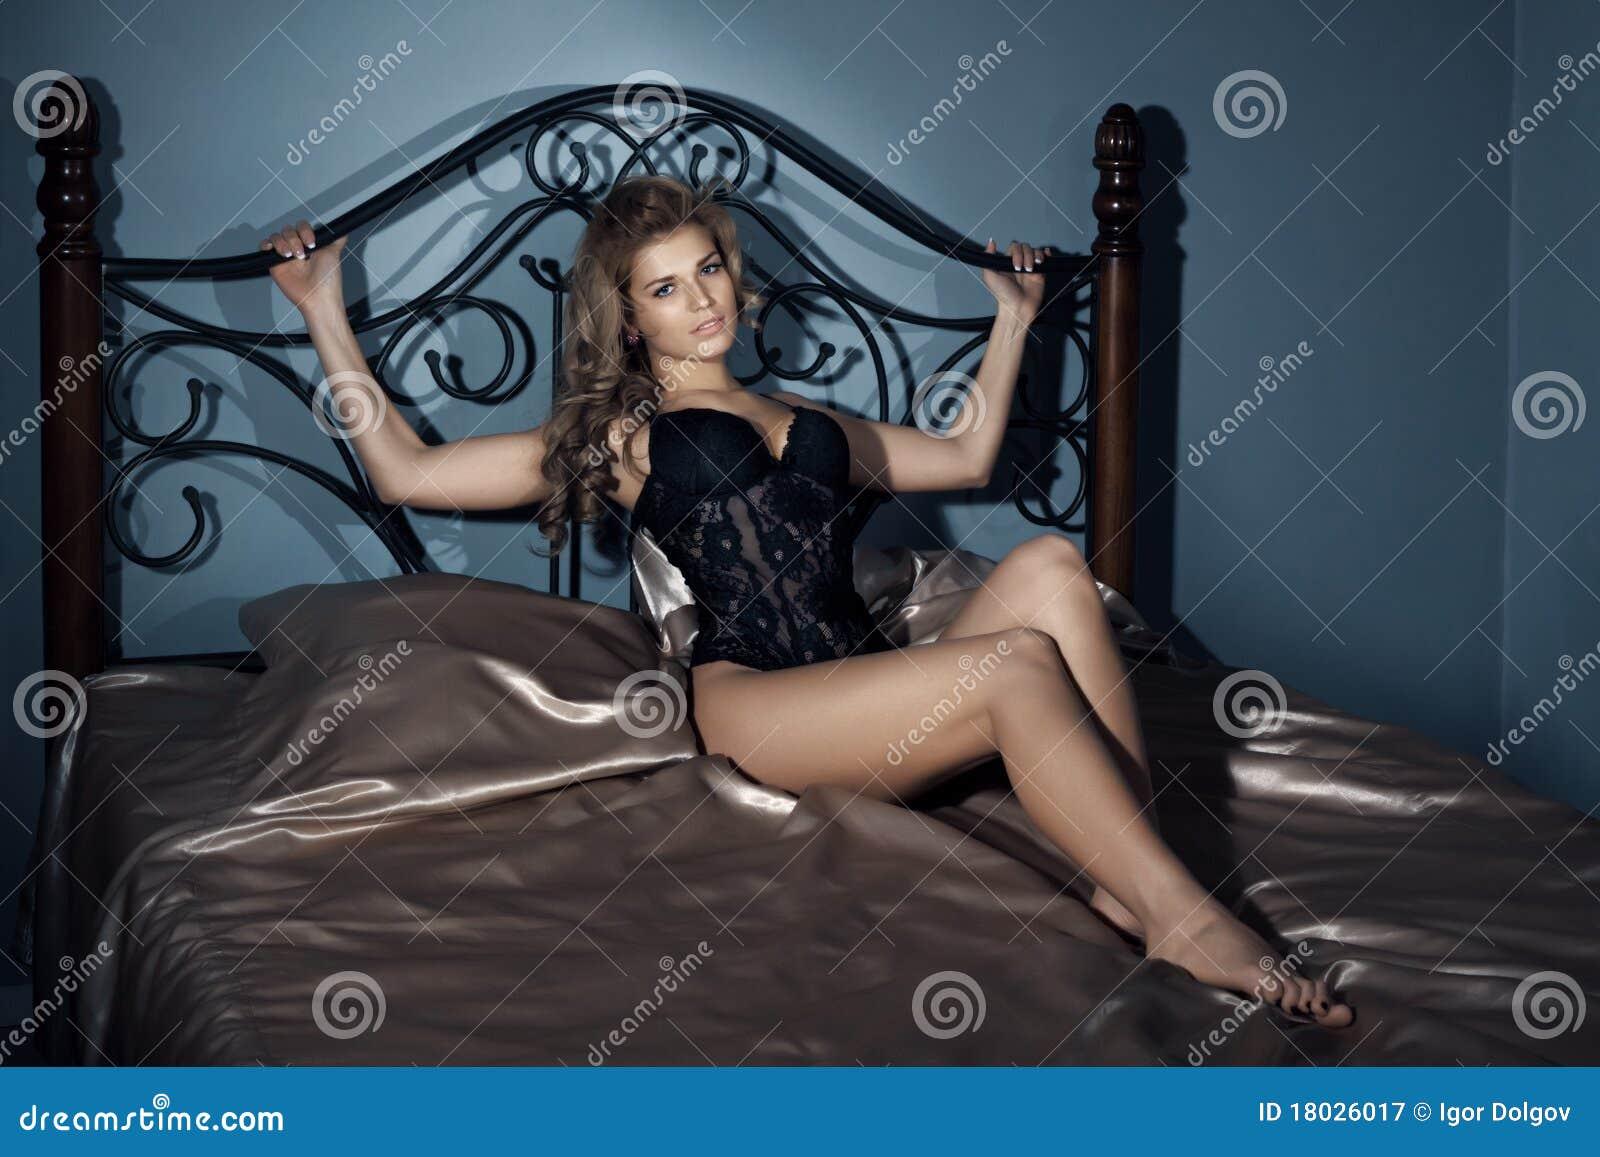 Голая Девушка Привязана К Кровати